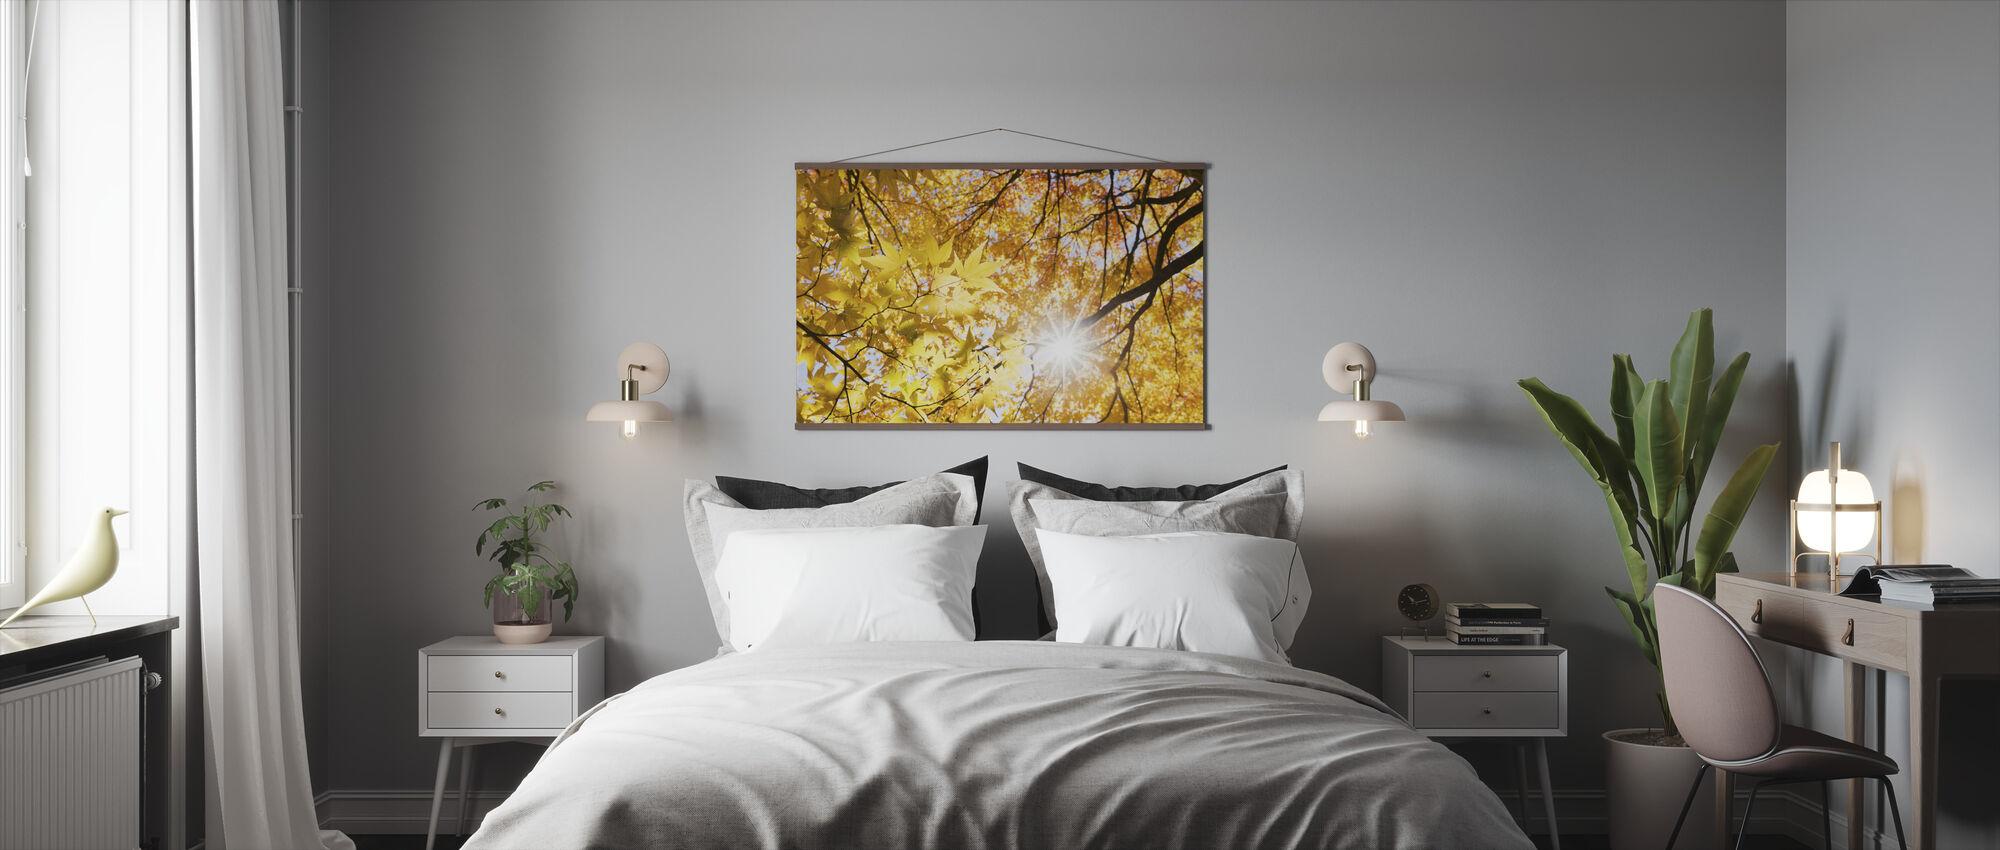 Autumn Sunlight - Poster - Bedroom